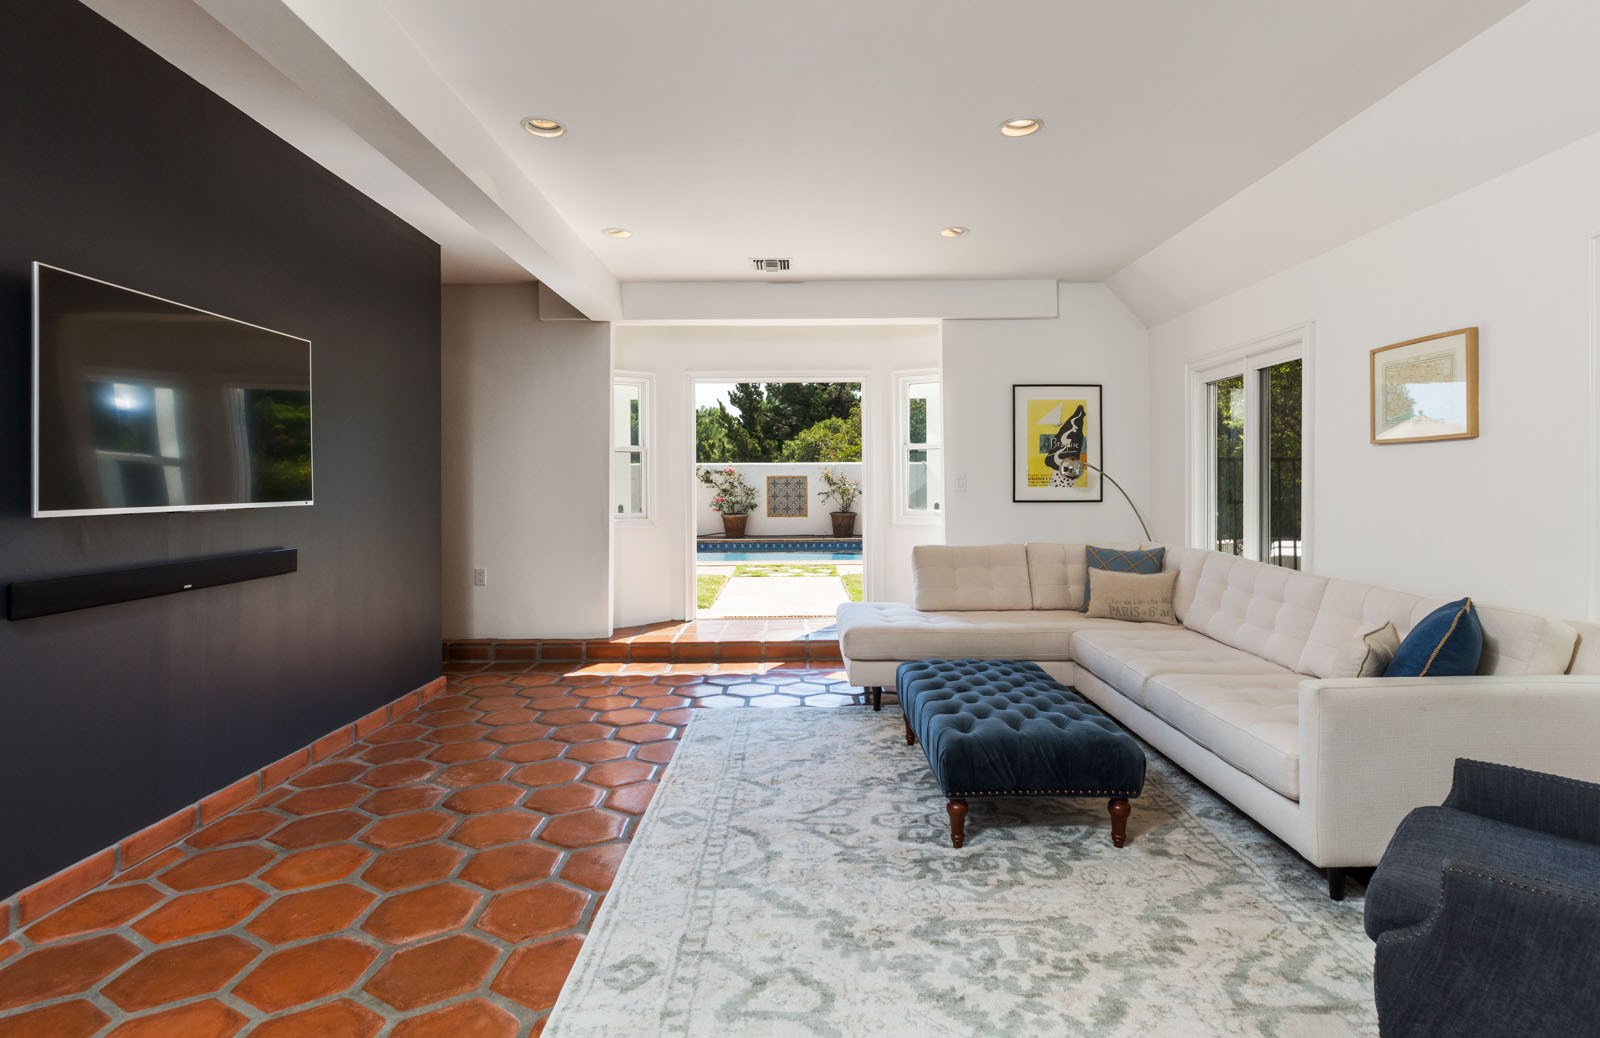 013 Living 1712 Manzanita Park Avenue Malibu For Sale Lease The Malibu Life Team Luxury Real Estate.jpg